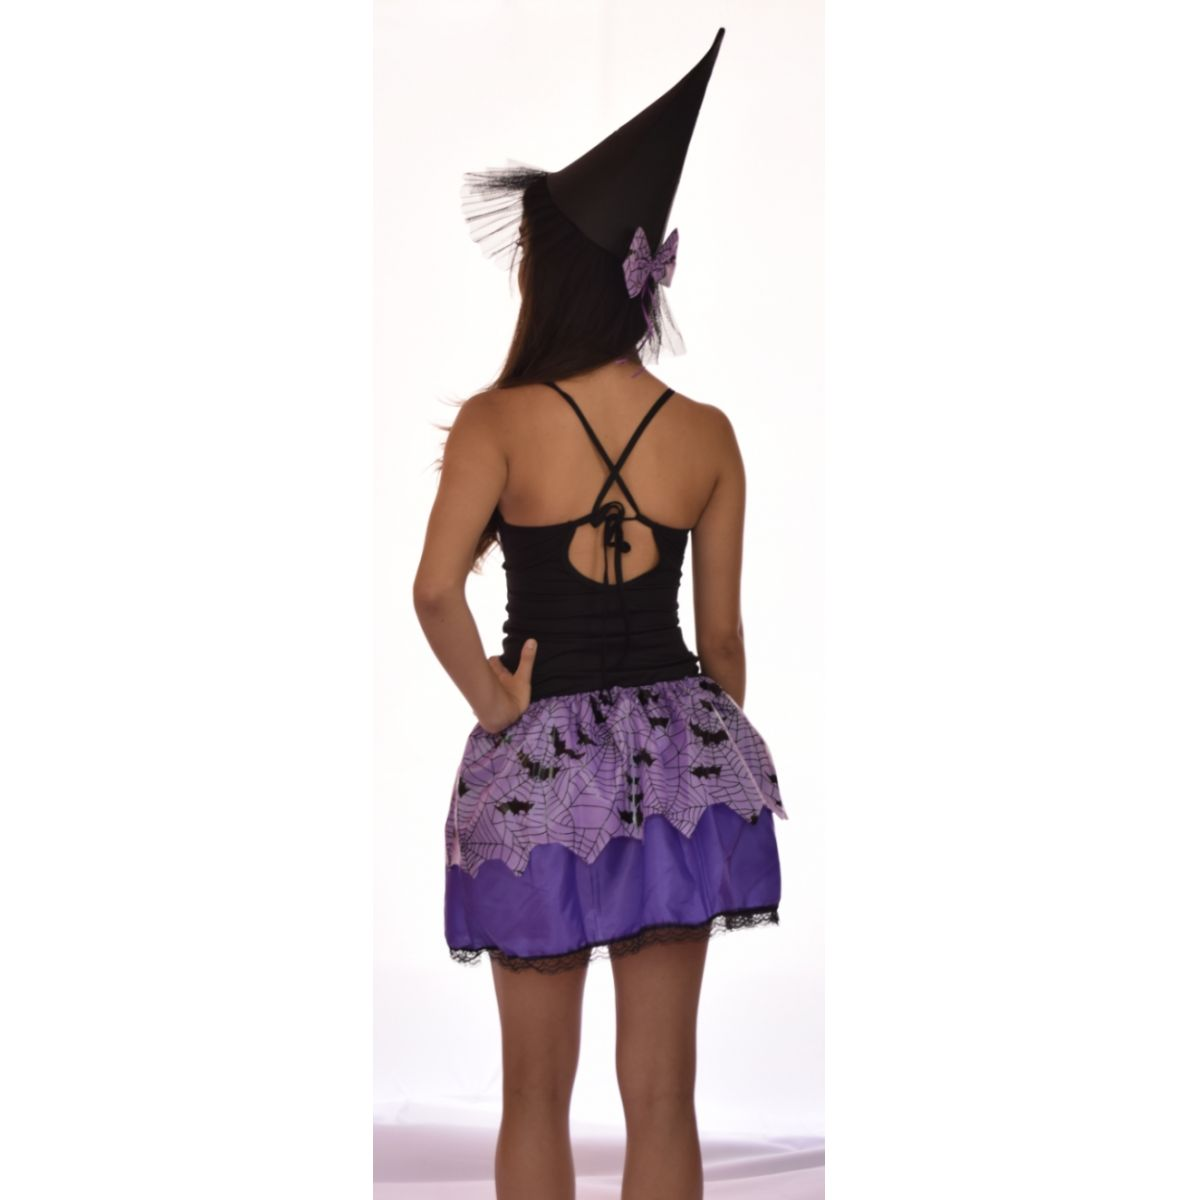 Fantasia Bruxinha Halloween - Point Da Dança - fantasia para festa carnaval